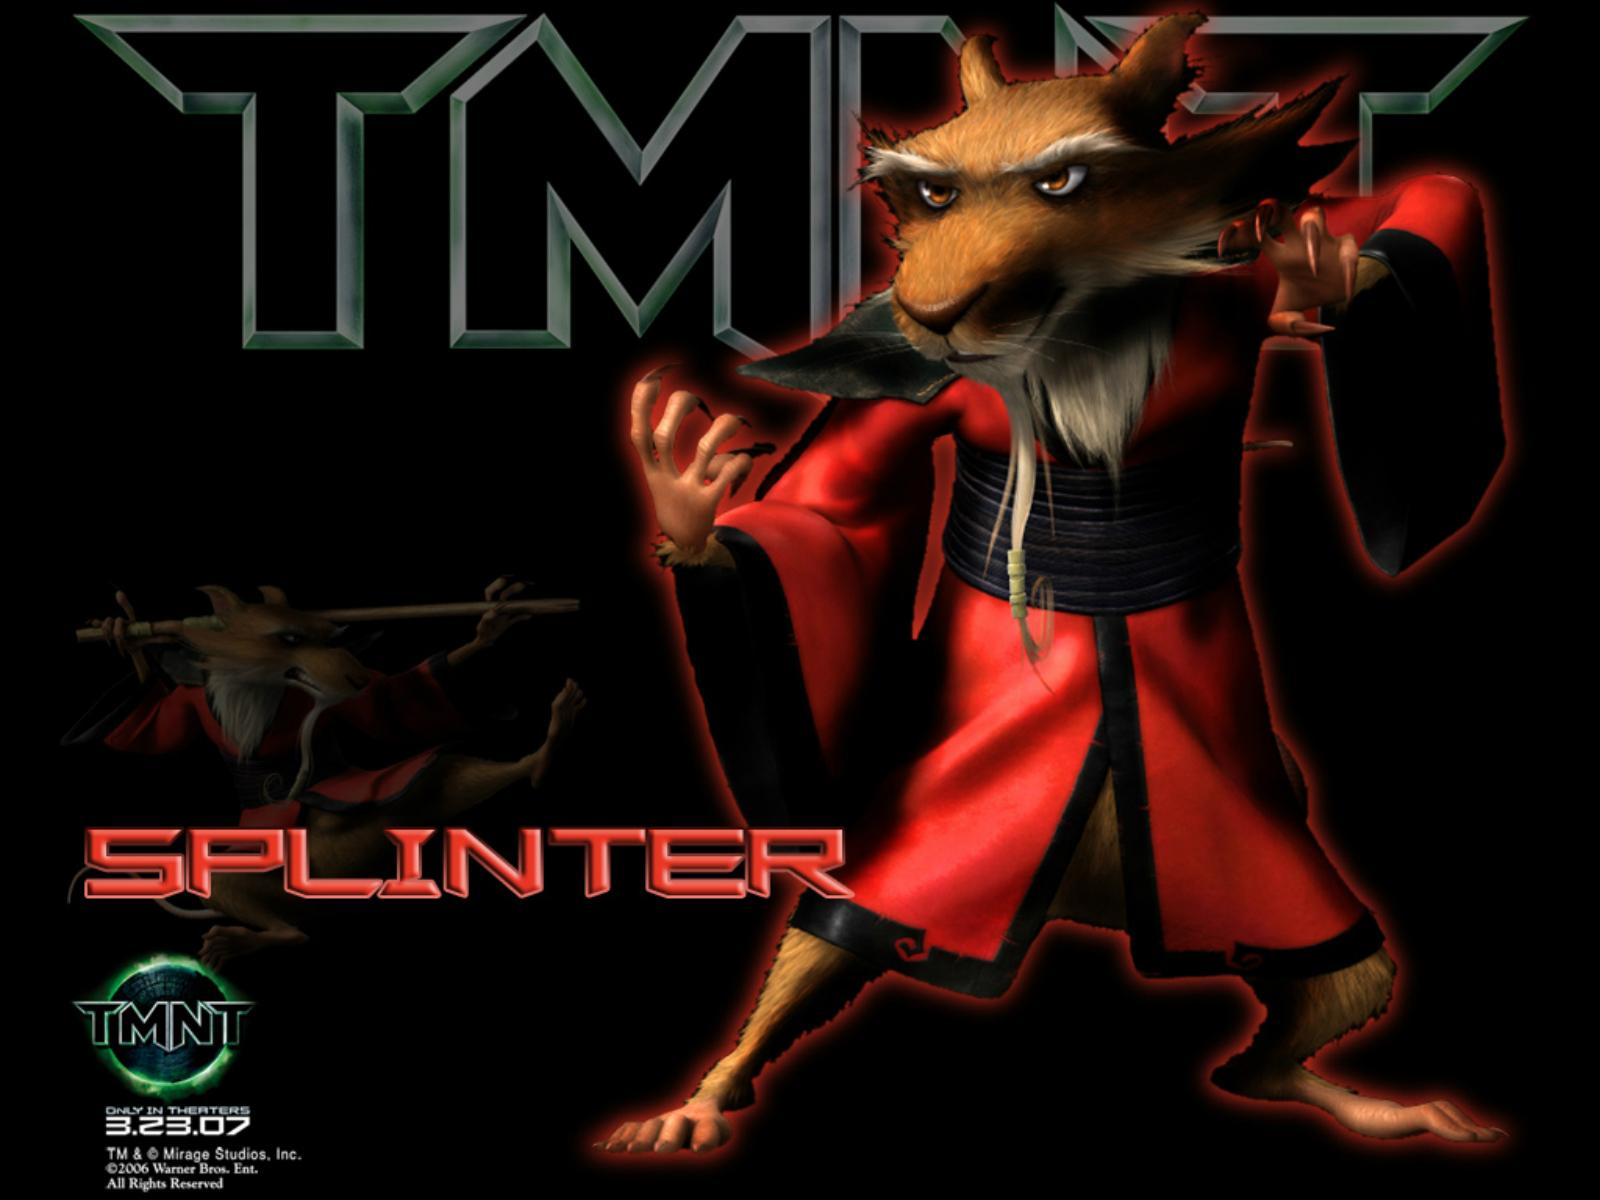 Teenage Mutant Ninja Turtles HD Wallpapers | HD Wallpaper ...